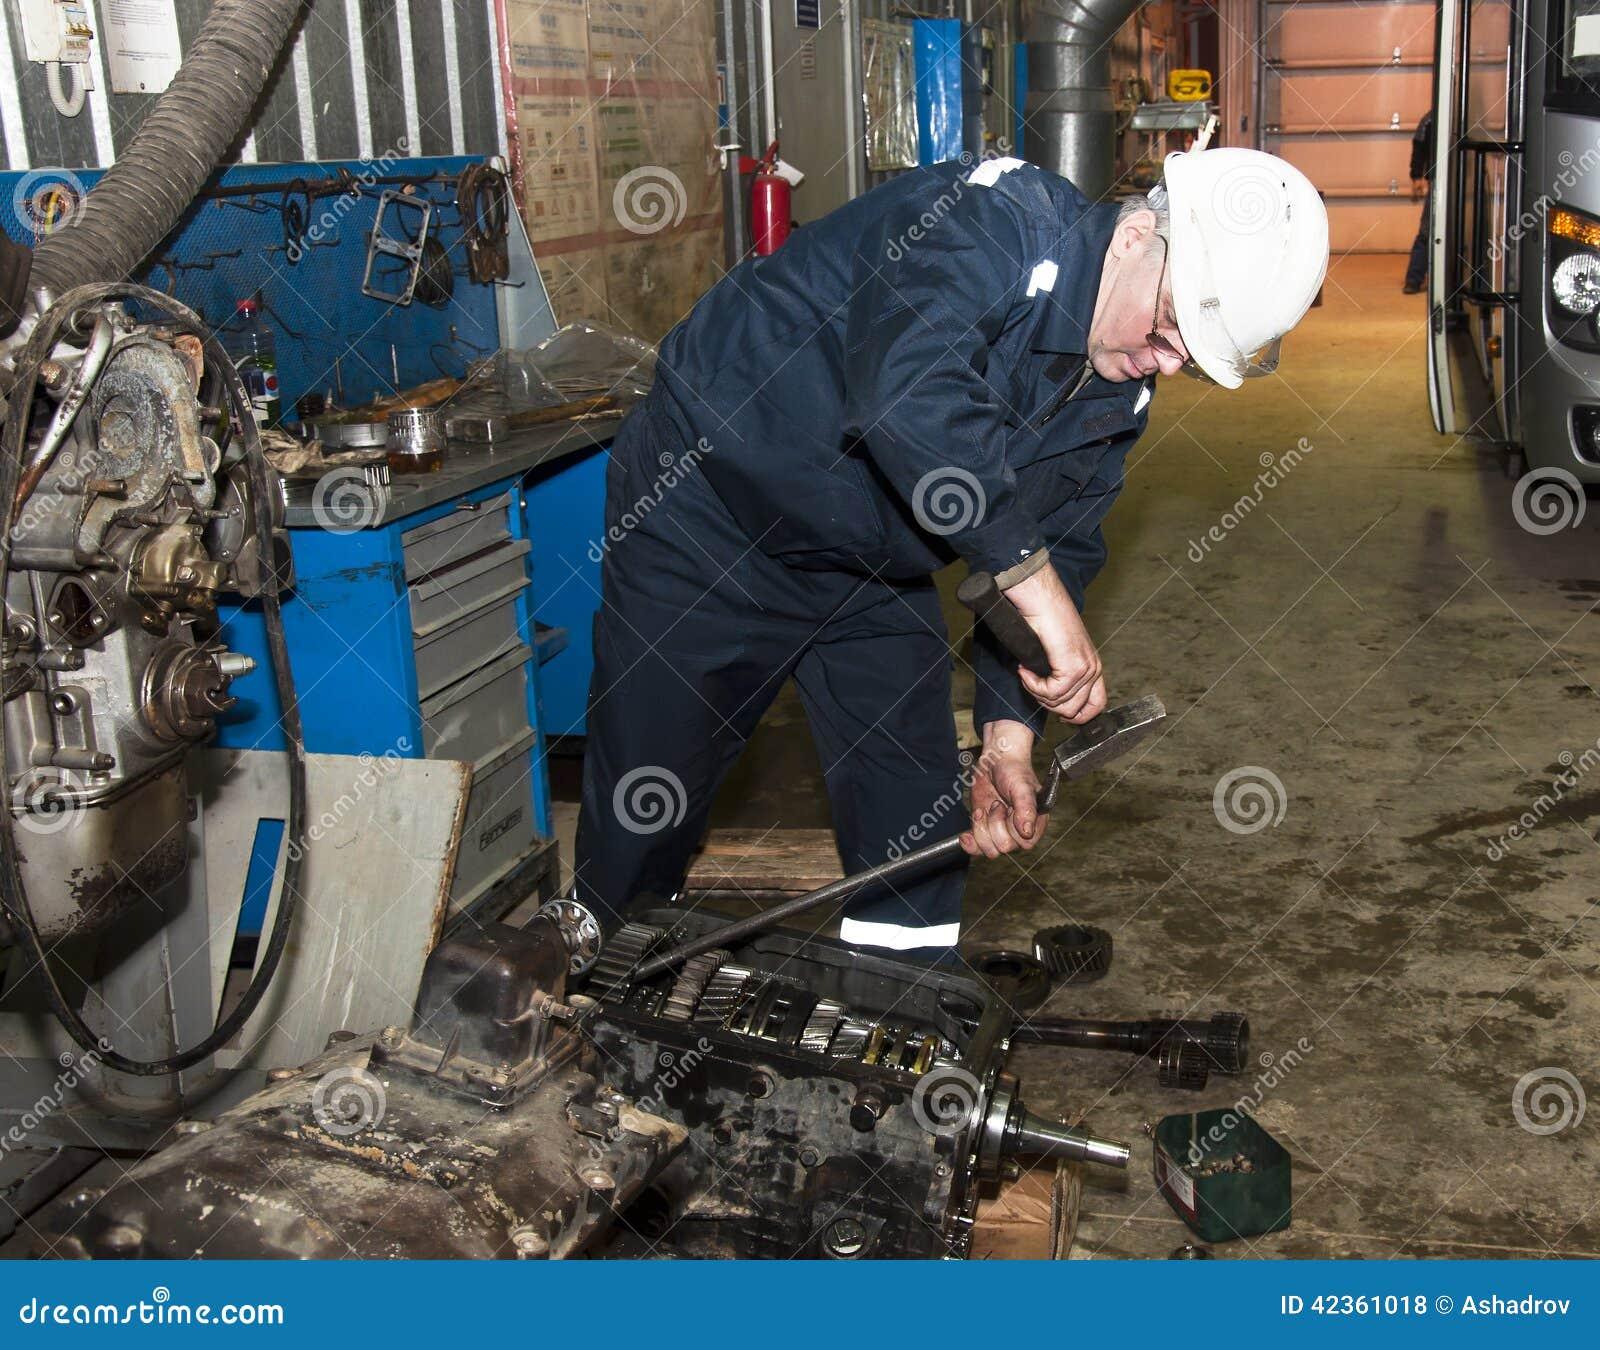 Poor People Car Repairs